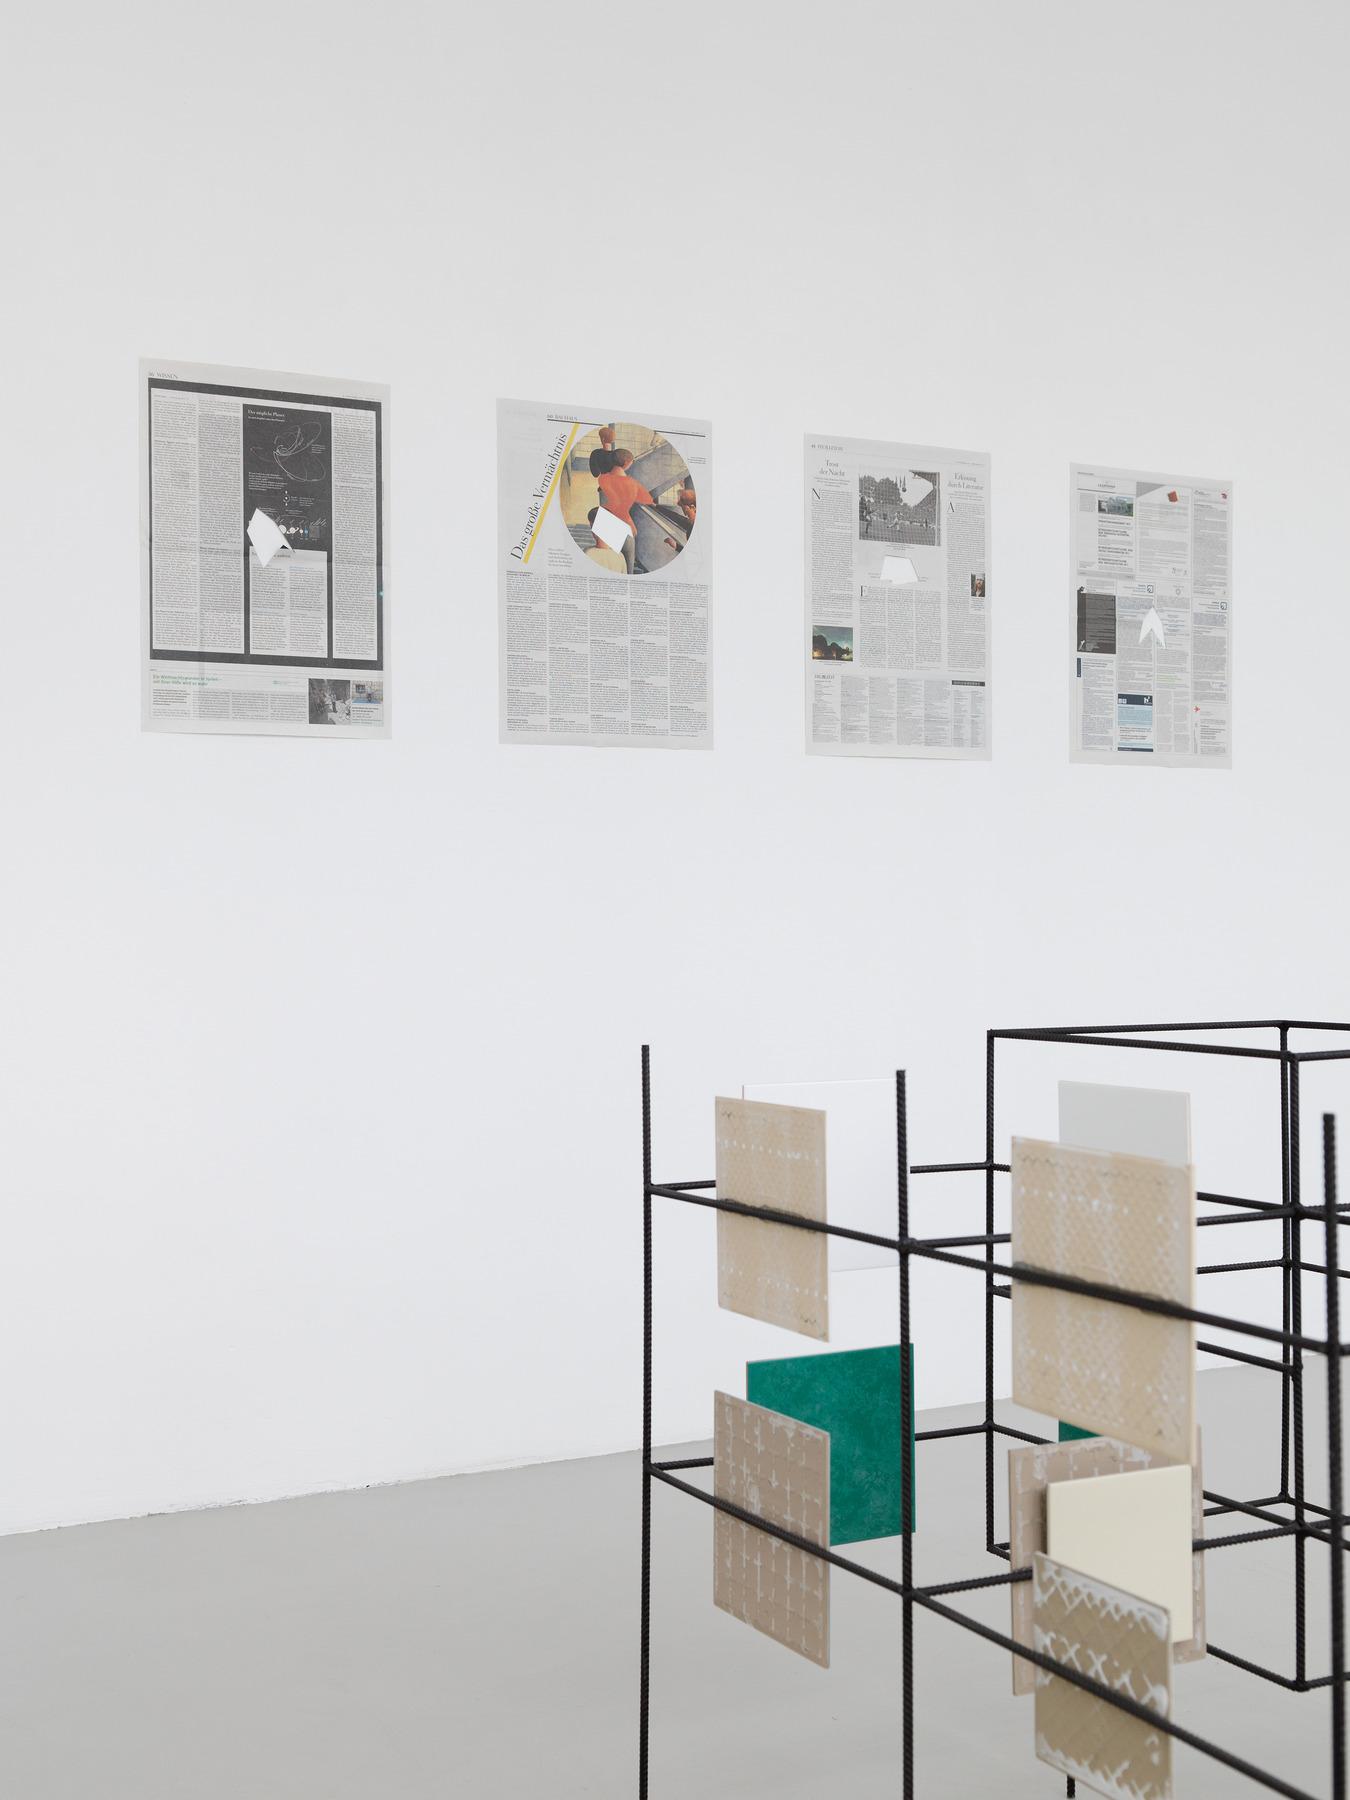 19_Edit Oderbolz_Kunstverein Nürnberg_2017